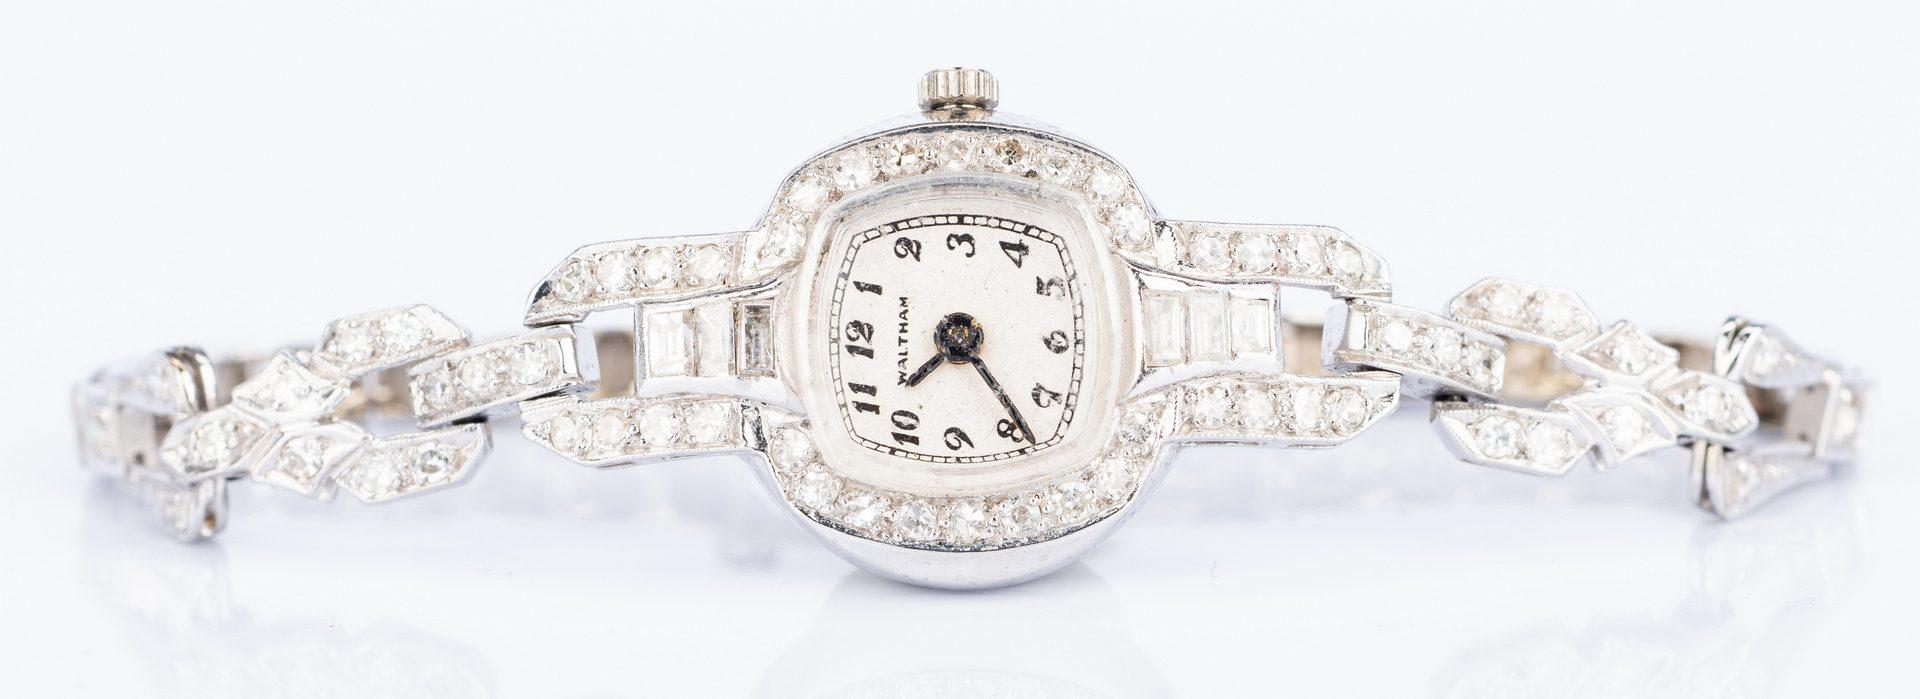 Lot 46: Art Deco Waltham Diamond Watch